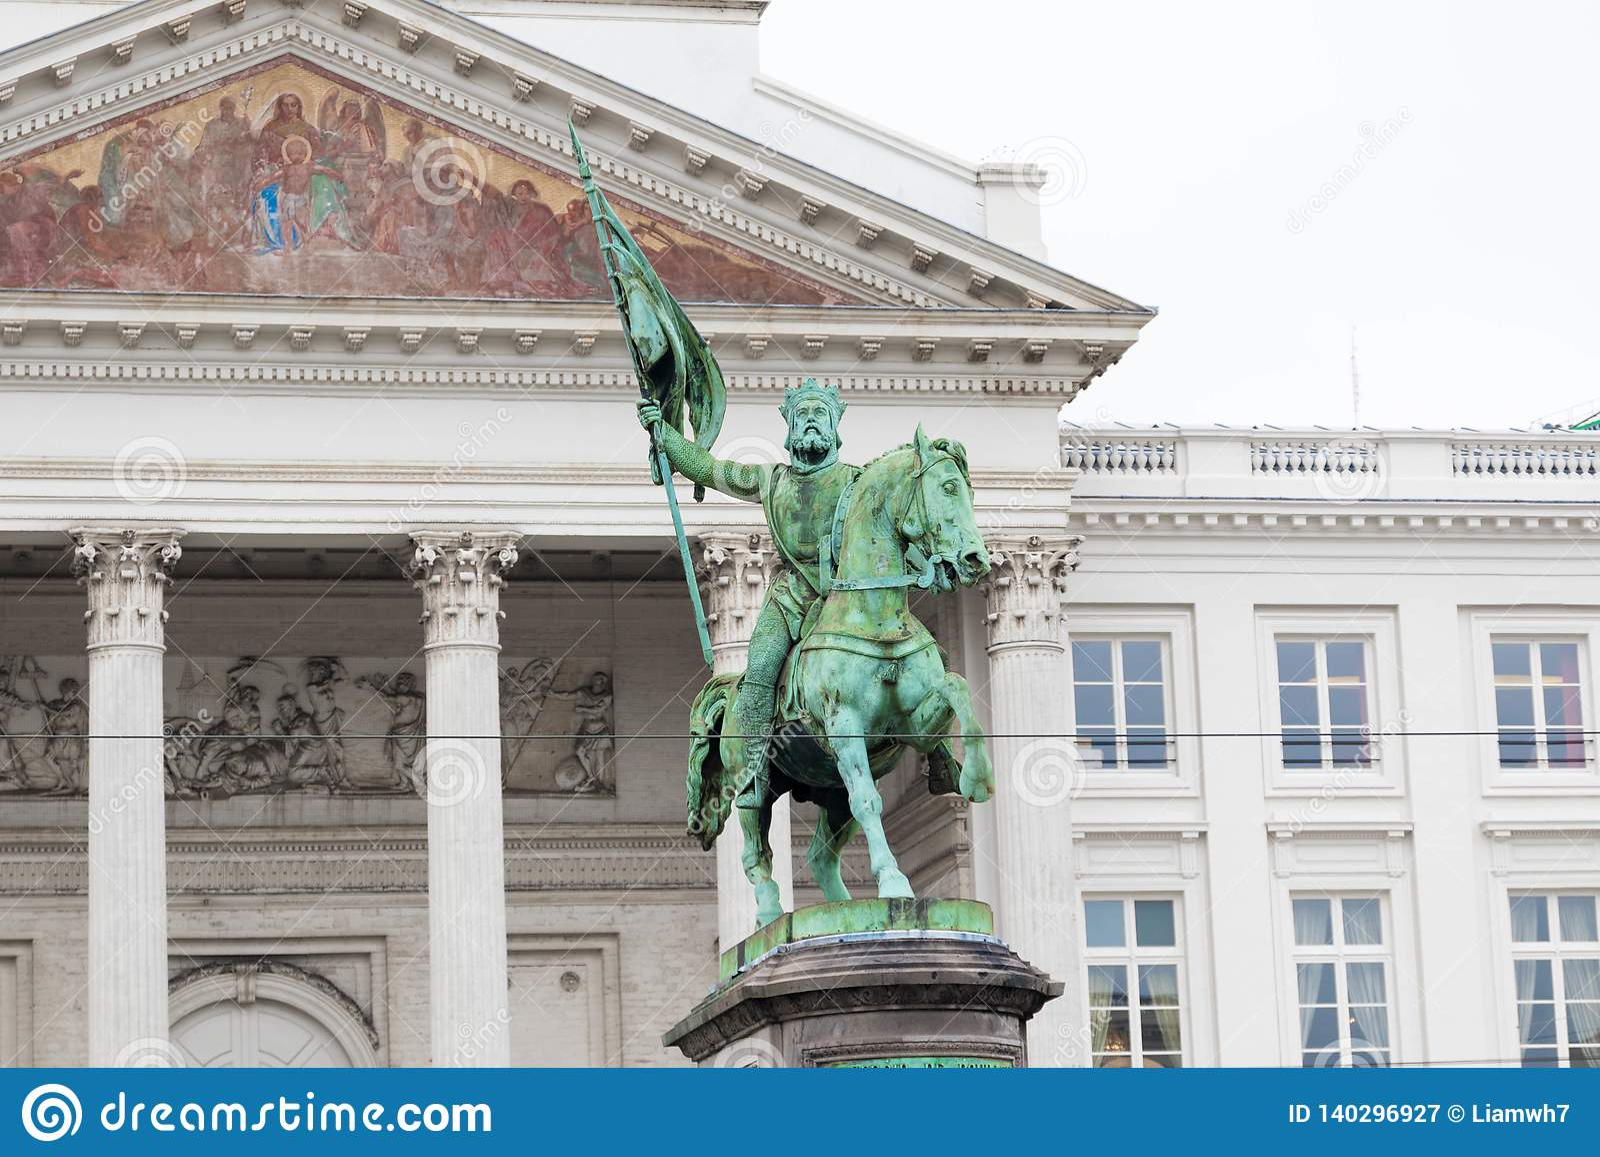 E 02 19: Koning Albert Statue In Brussels Belgium